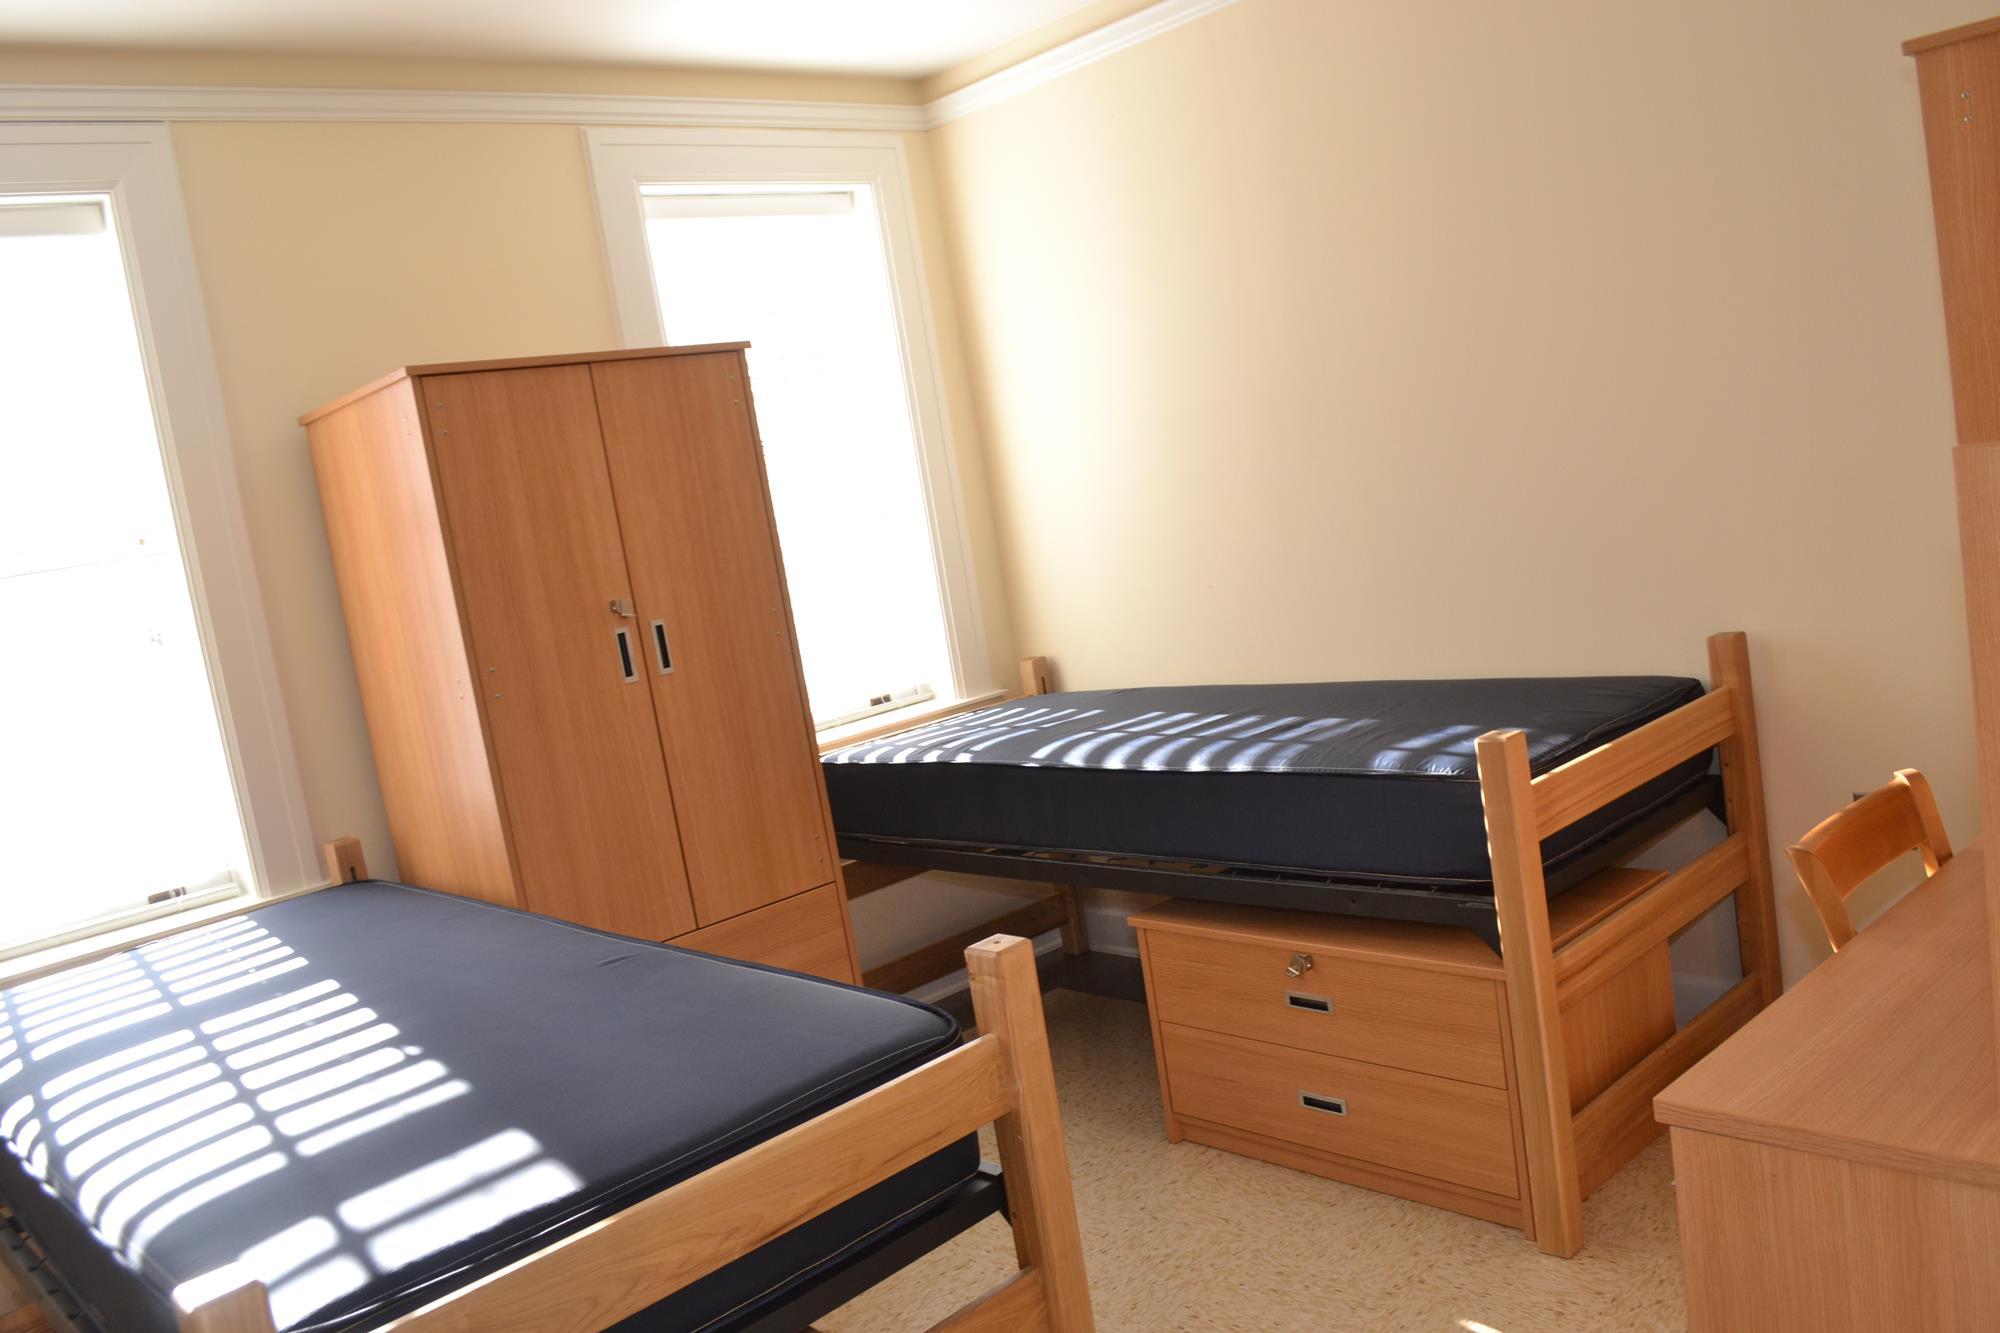 Dillard University Dorm Rooms